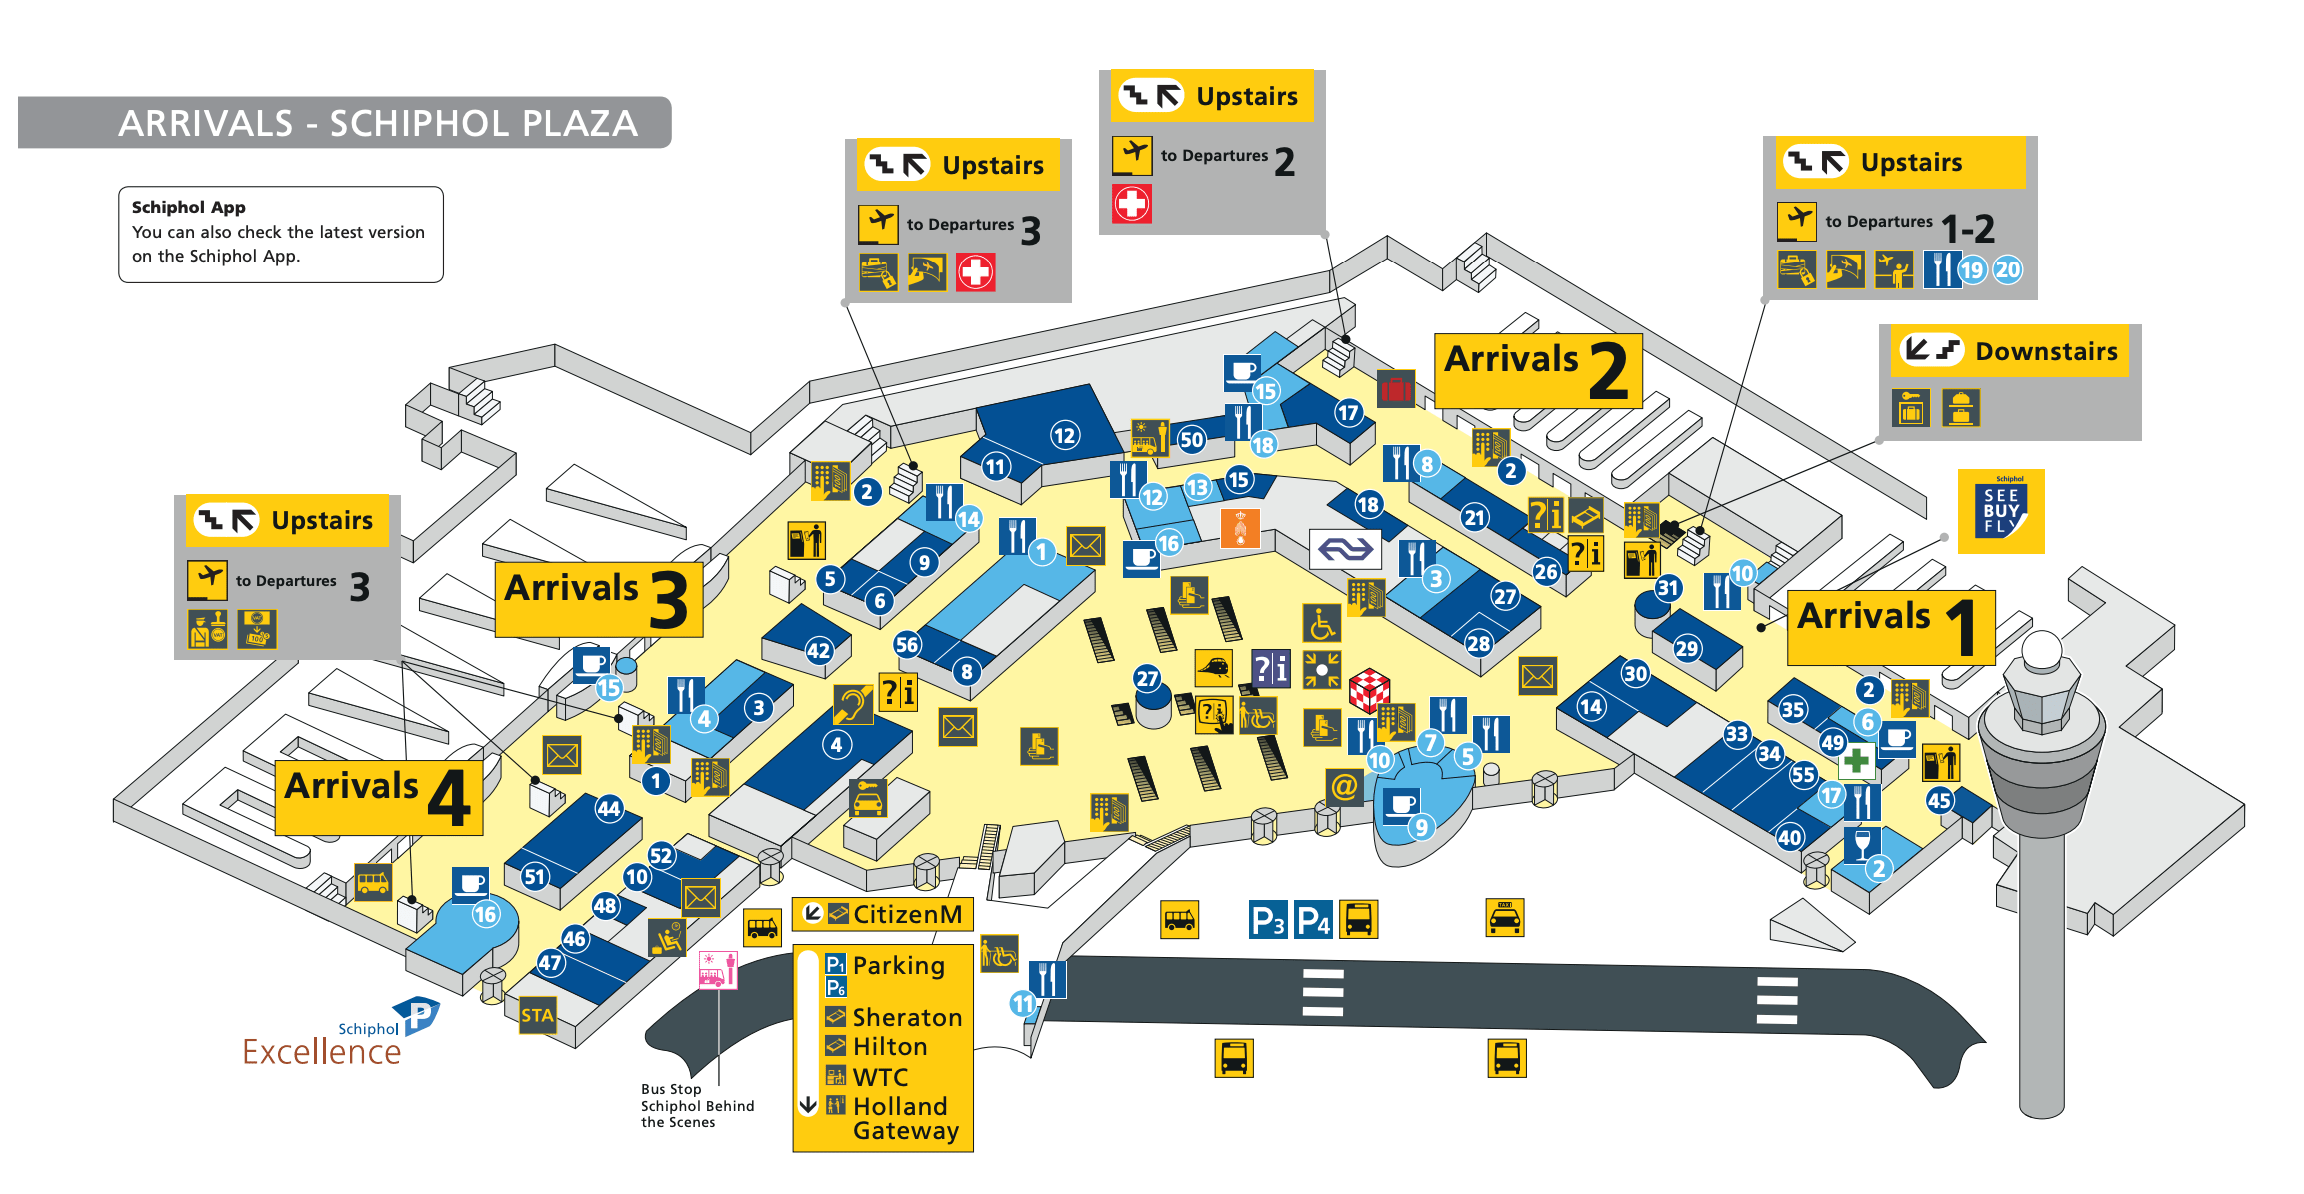 Como ir do aeroporto de Amsterdam para o centro - mapa do Aeroporto Schiphol